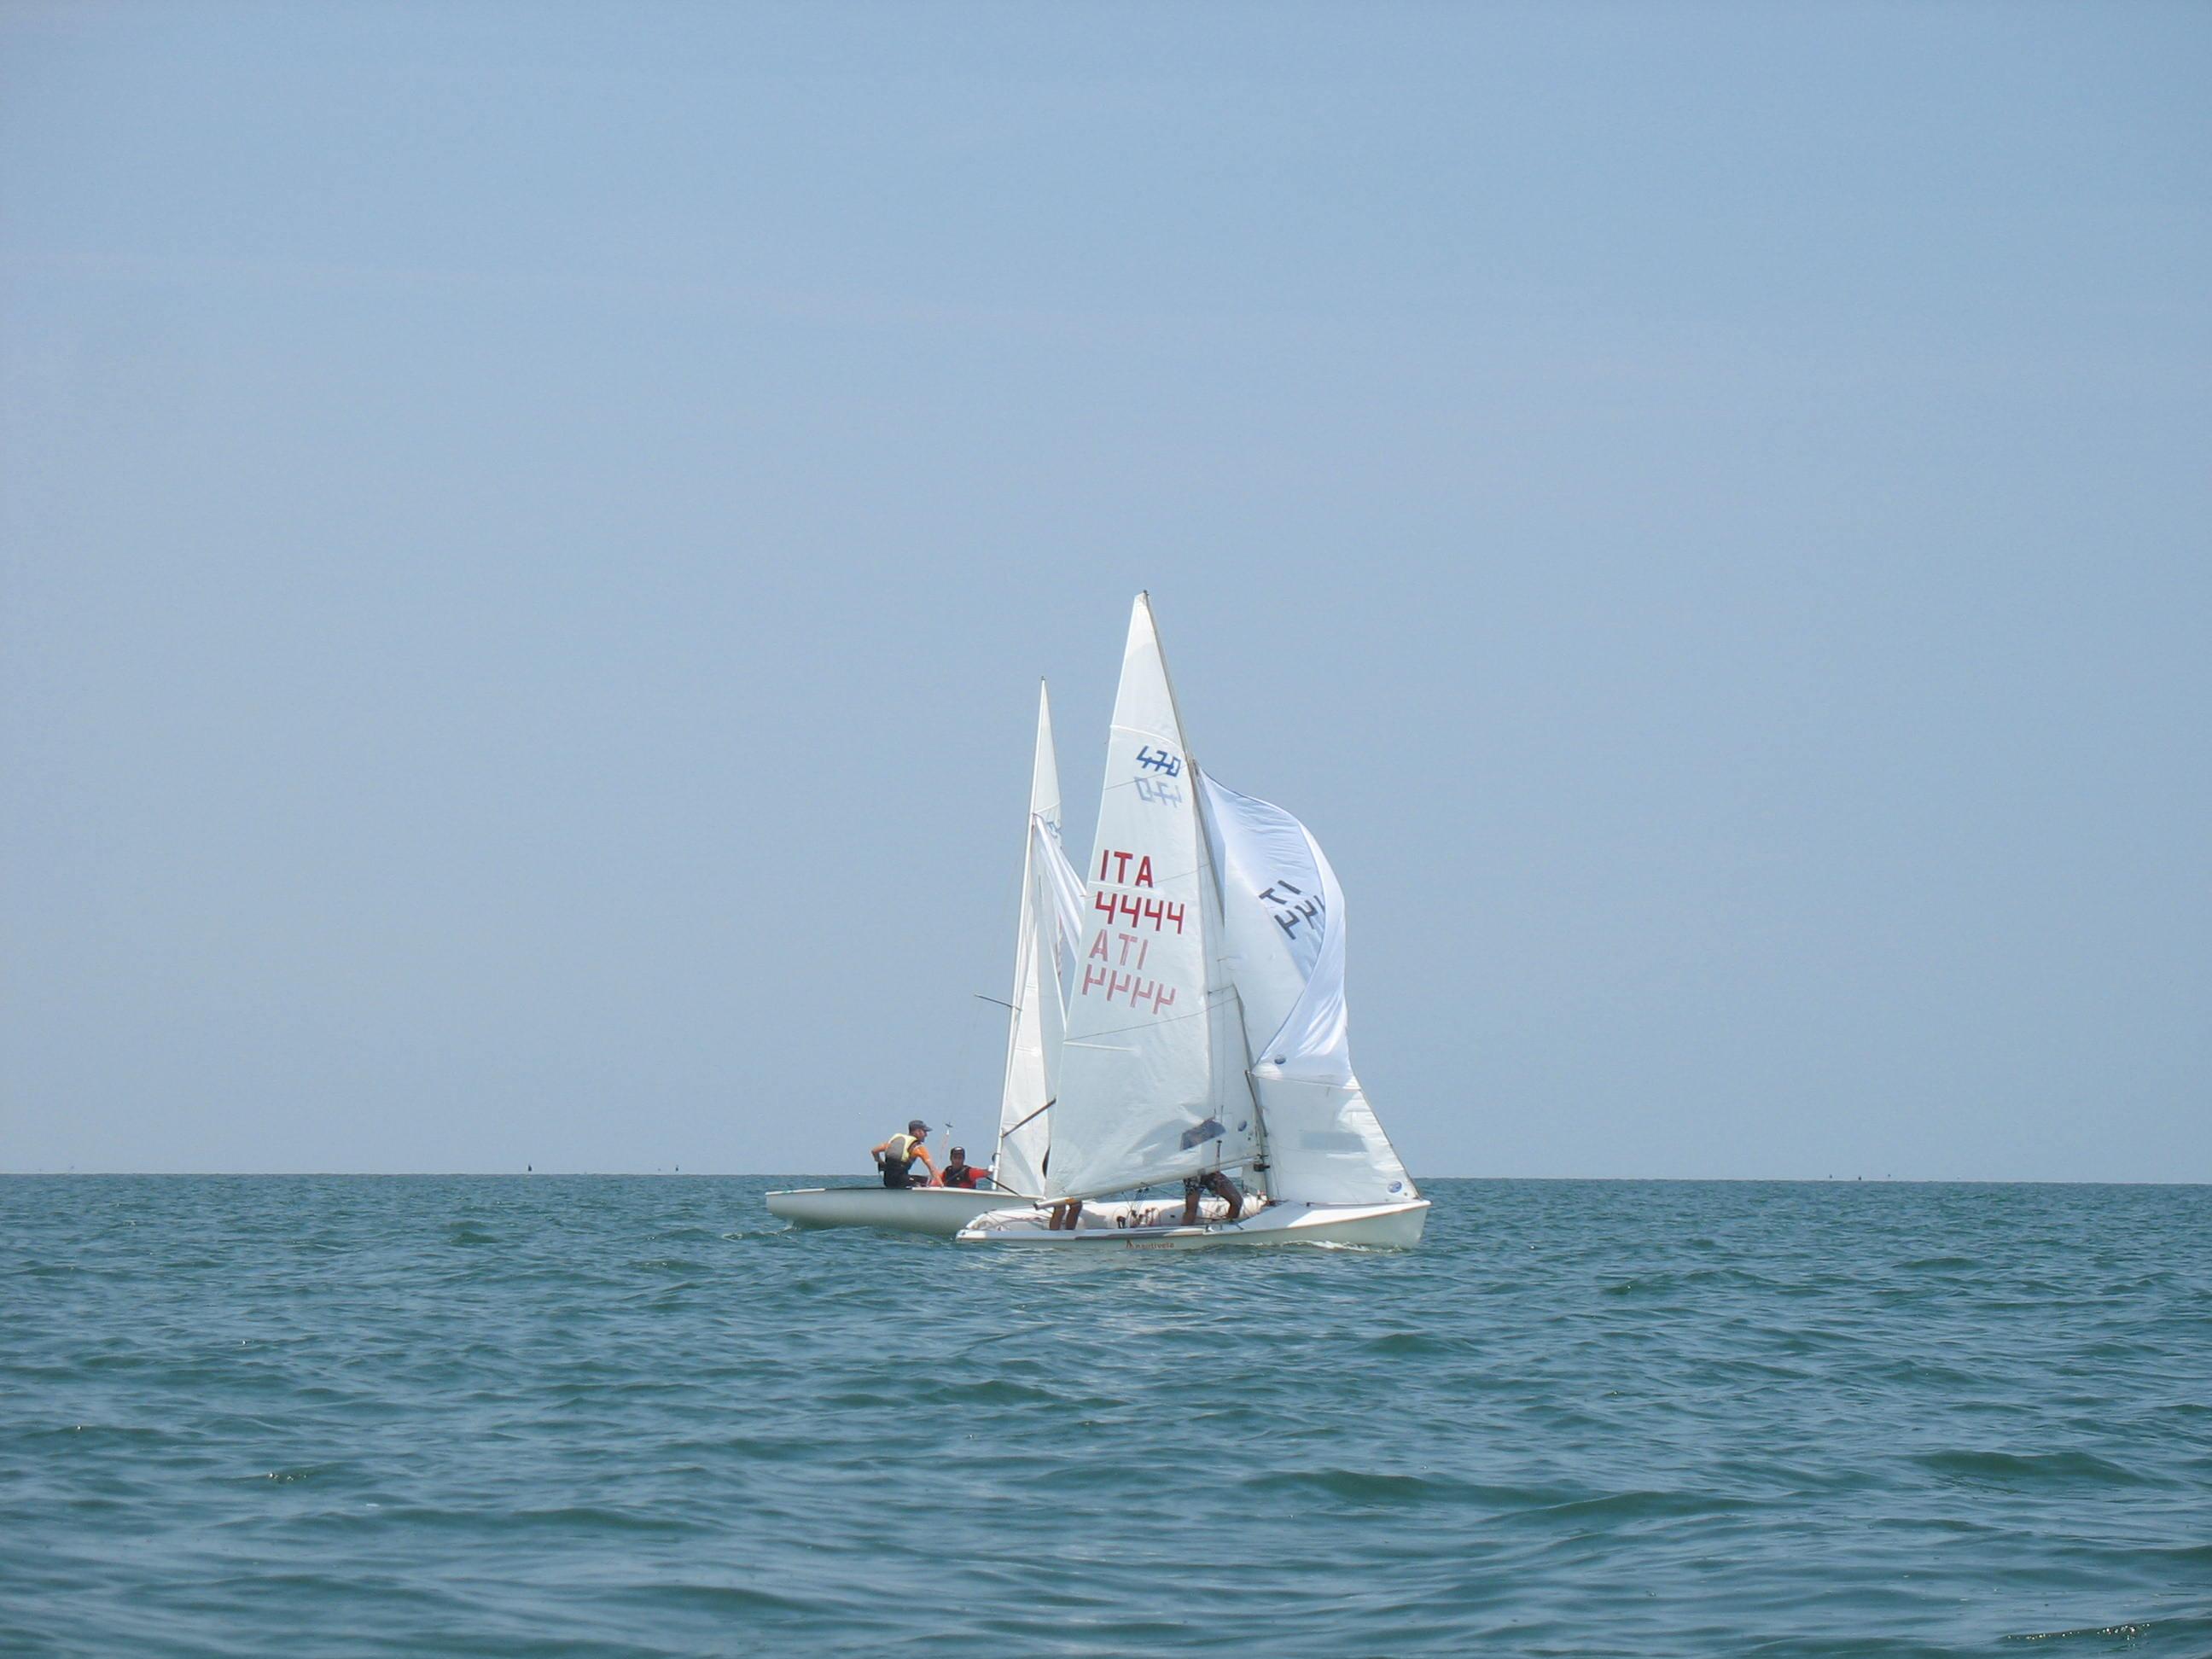 5-torneo-elia-tonelli-27062010-052